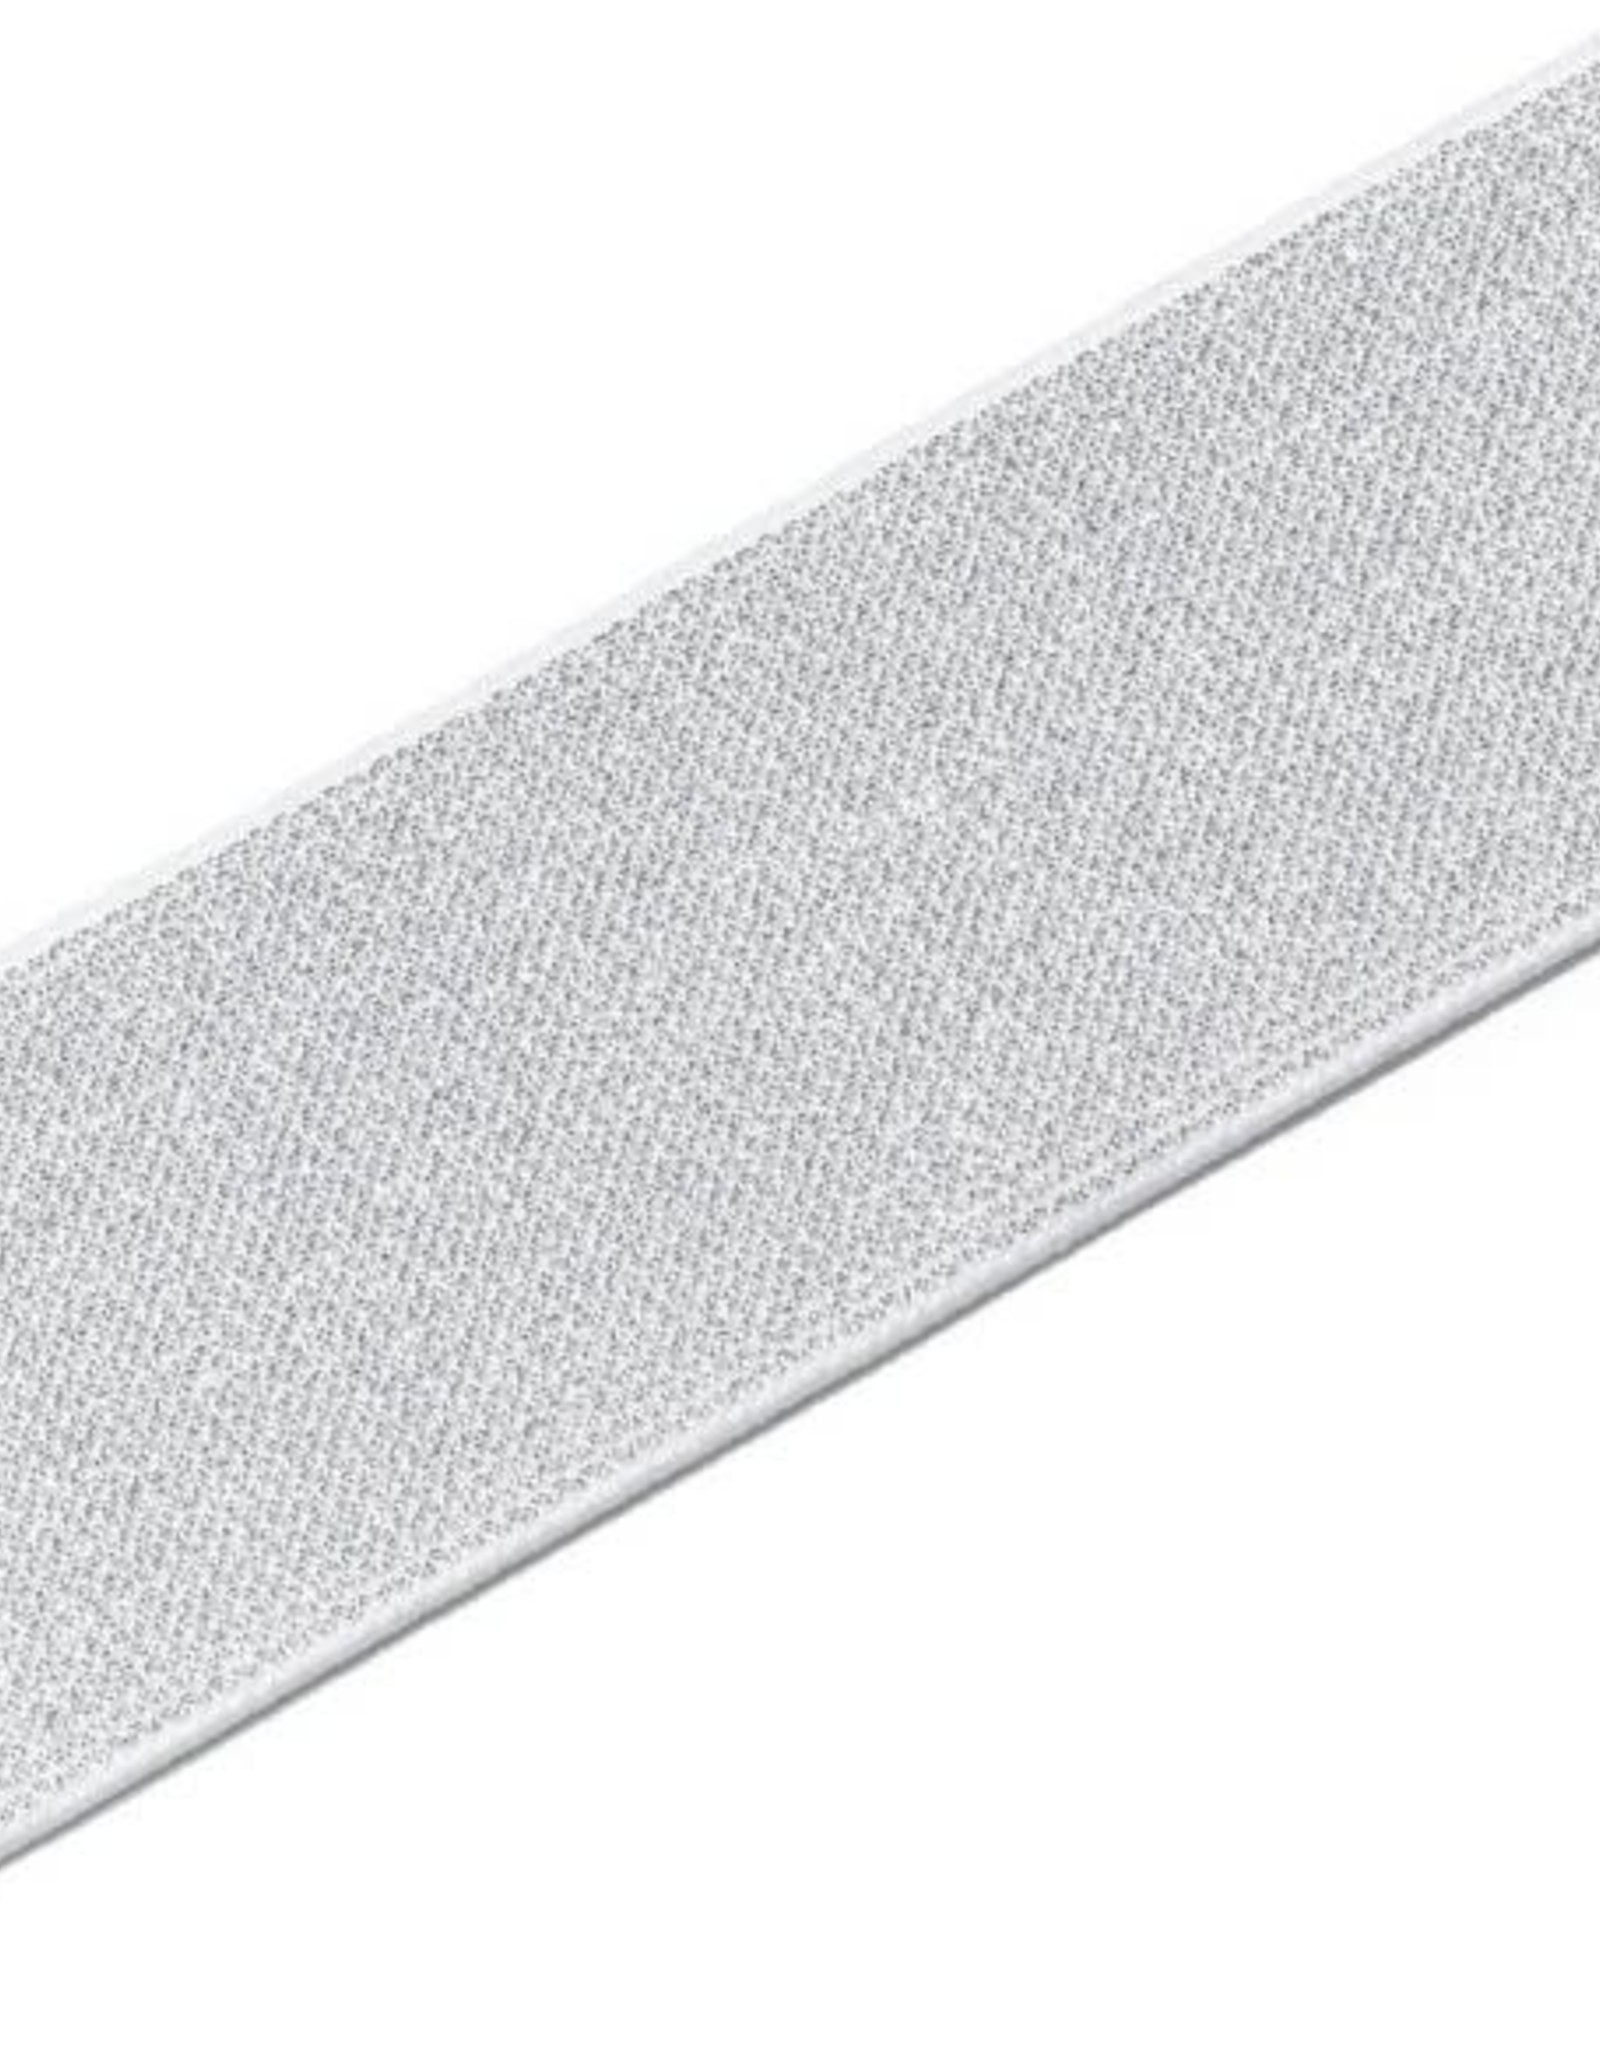 Prym Prym ELASTIEK COLOR WIT-ZILVER 50mm